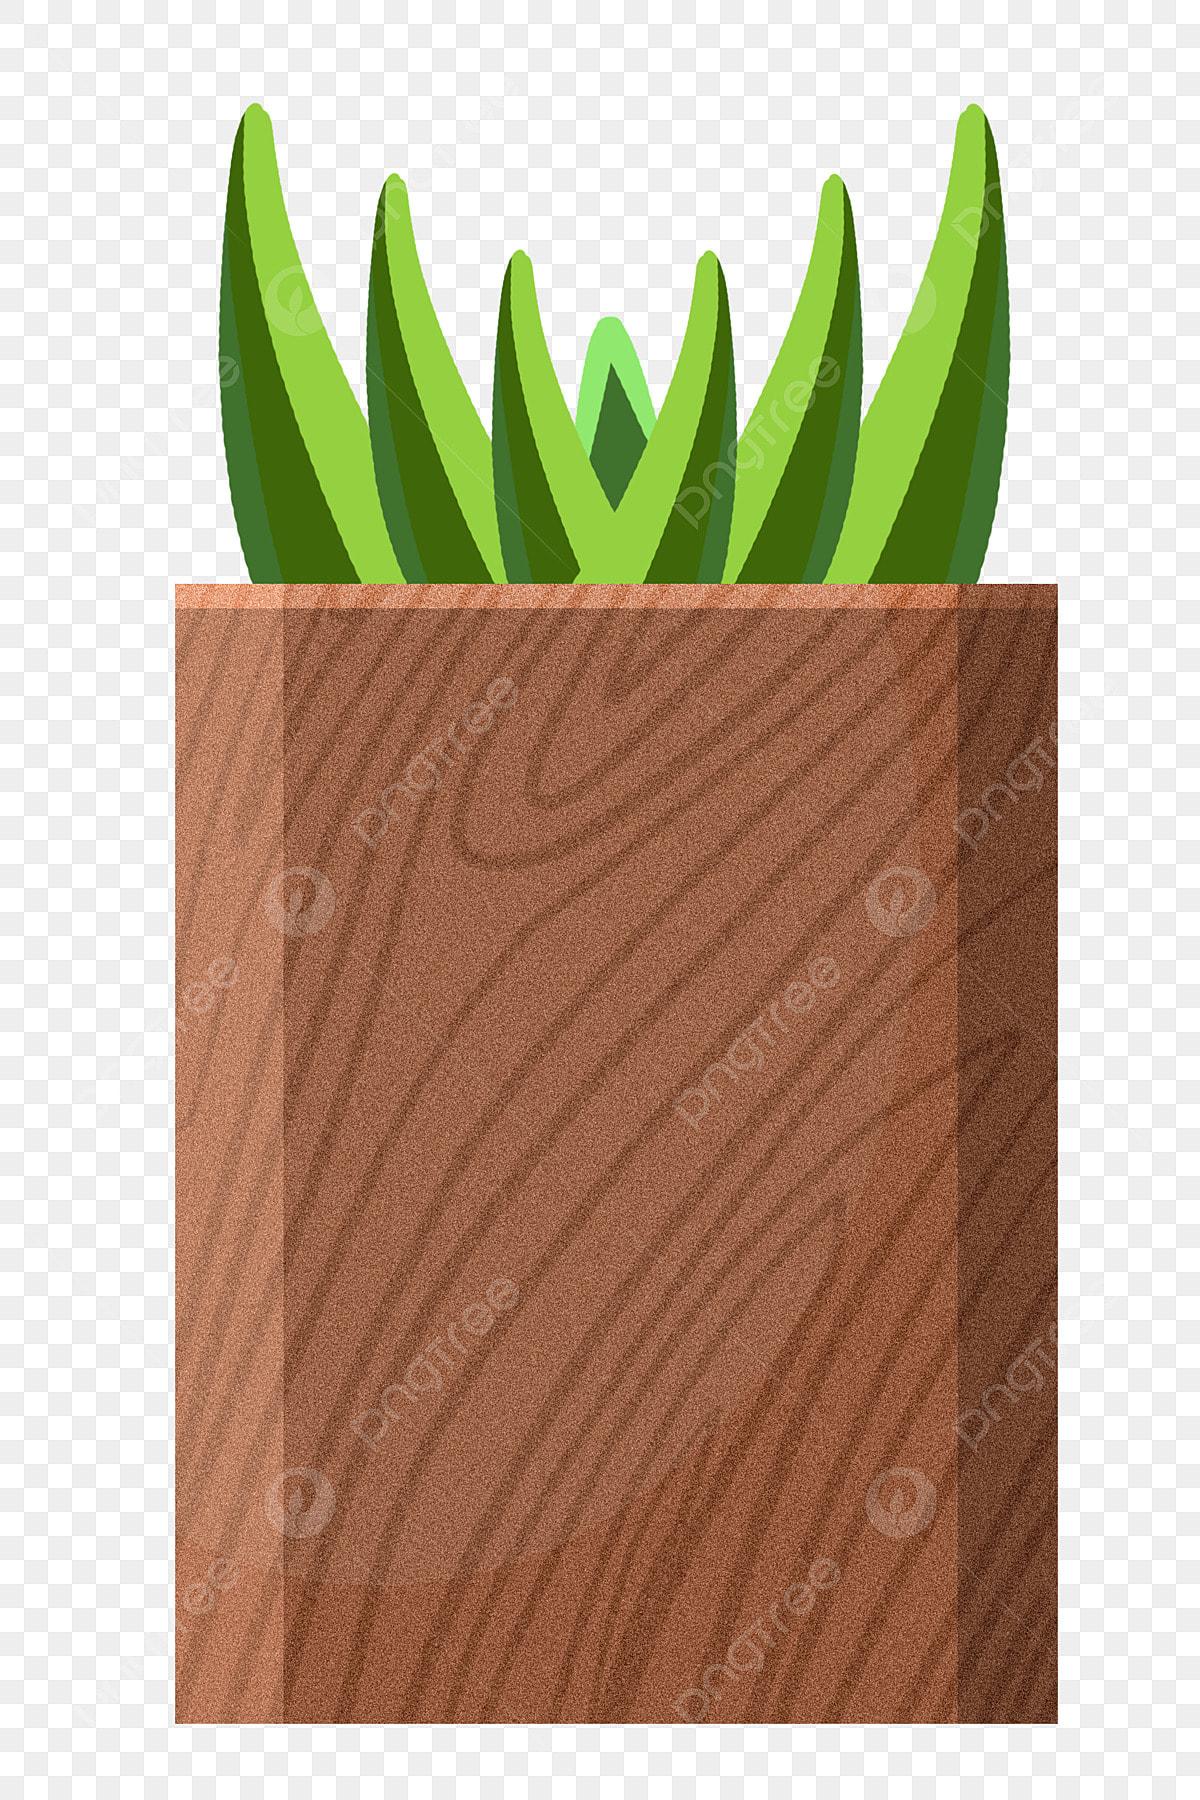 Pot Plante En Bois plantes en pot plantes en bois illustrations de plantes aloe